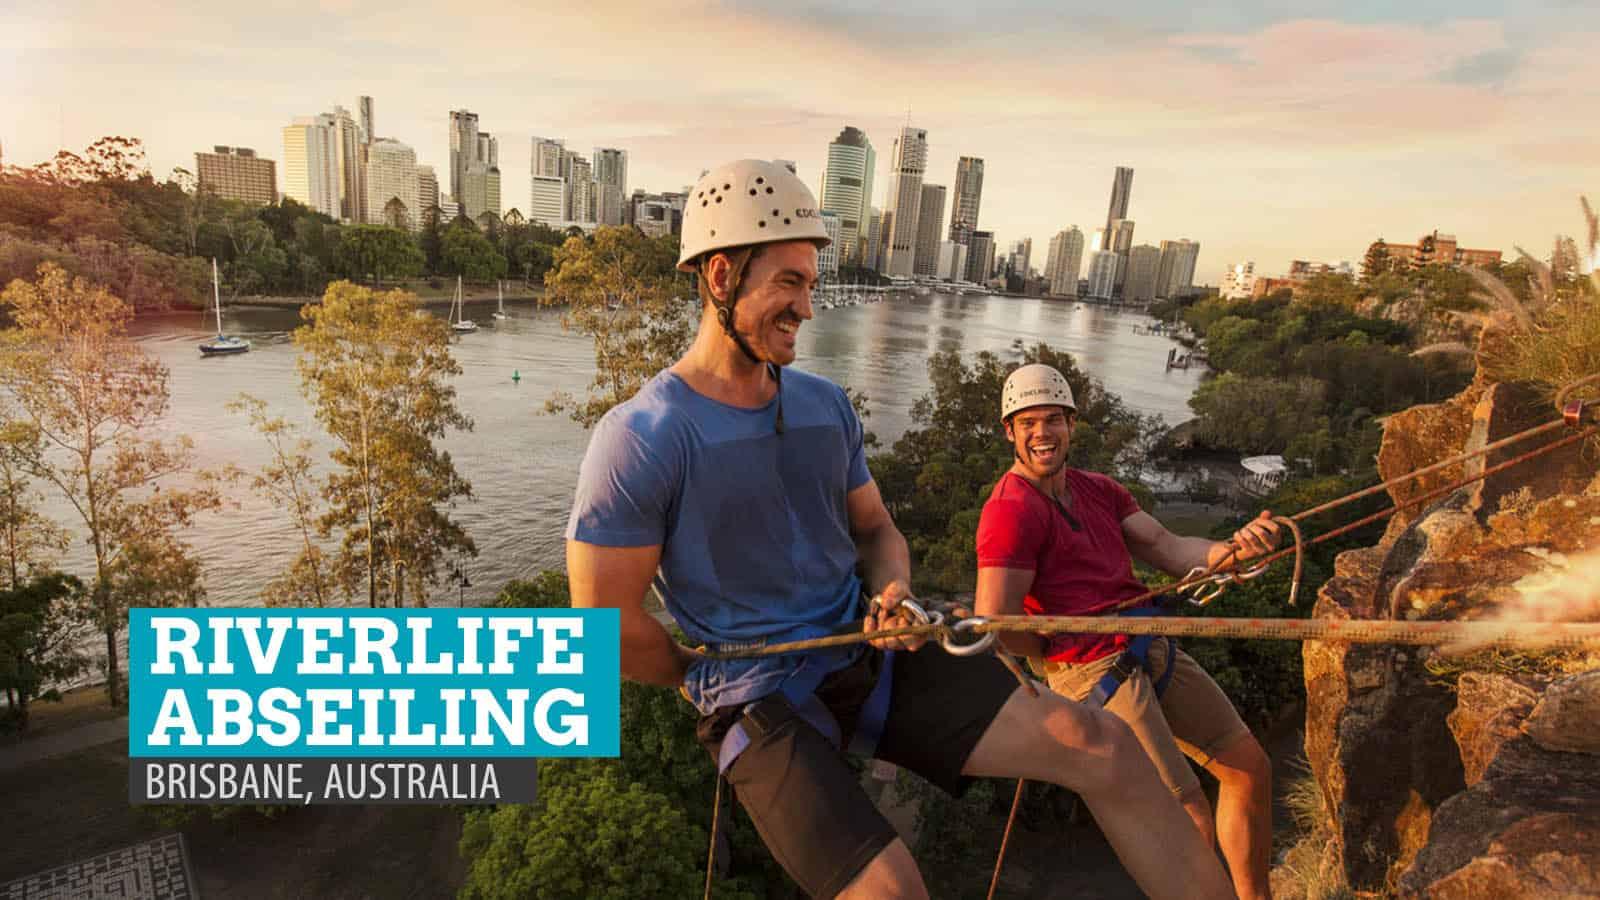 Riverlife Abseiling in Brisbane, Australia